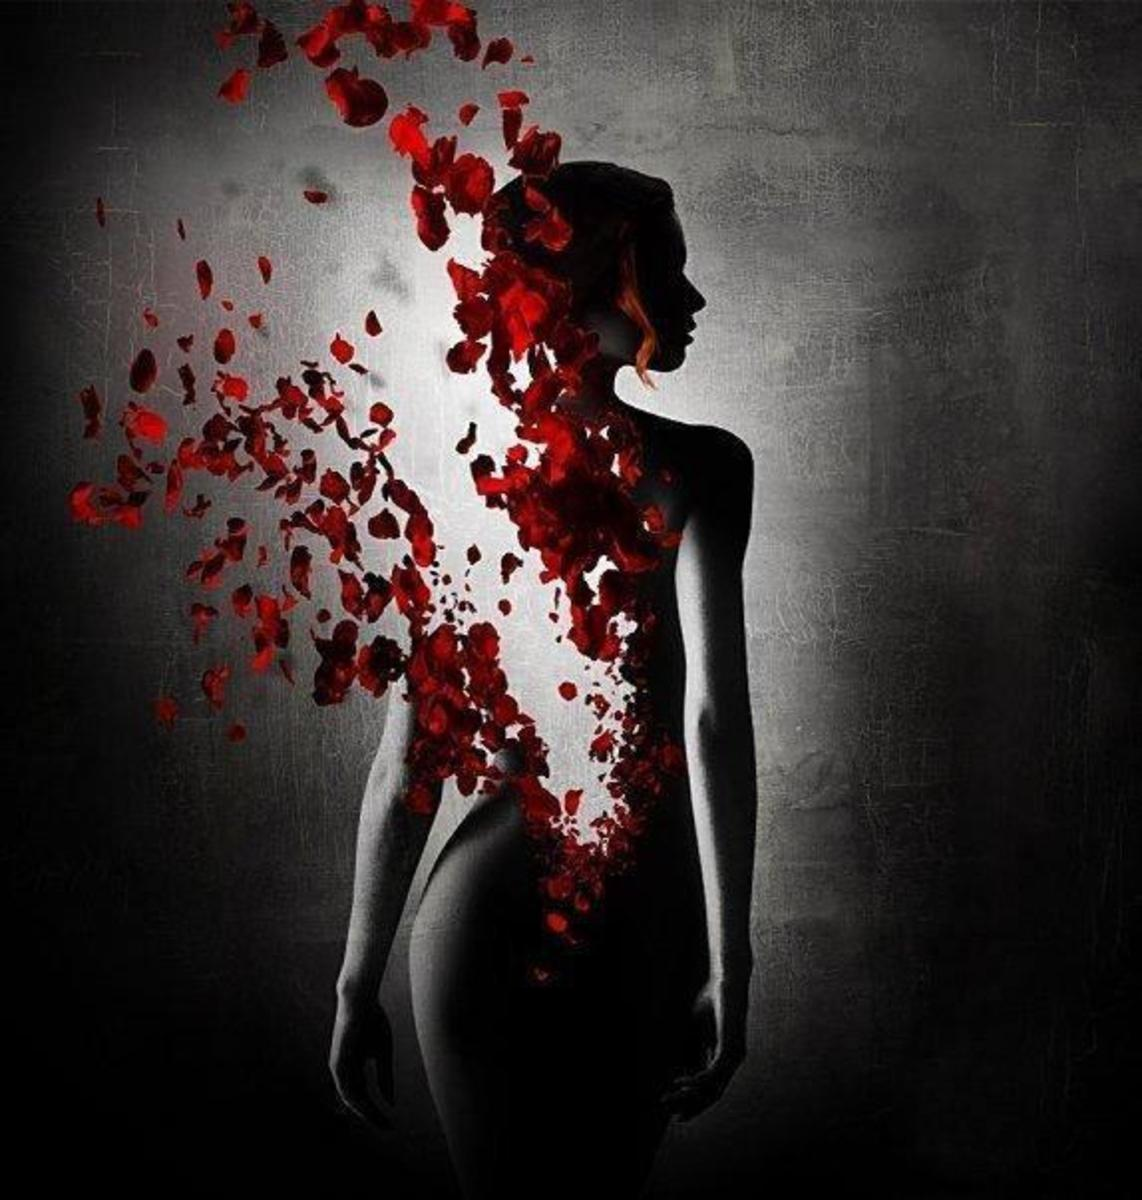 Transparent Girl - A Fictional Short Story